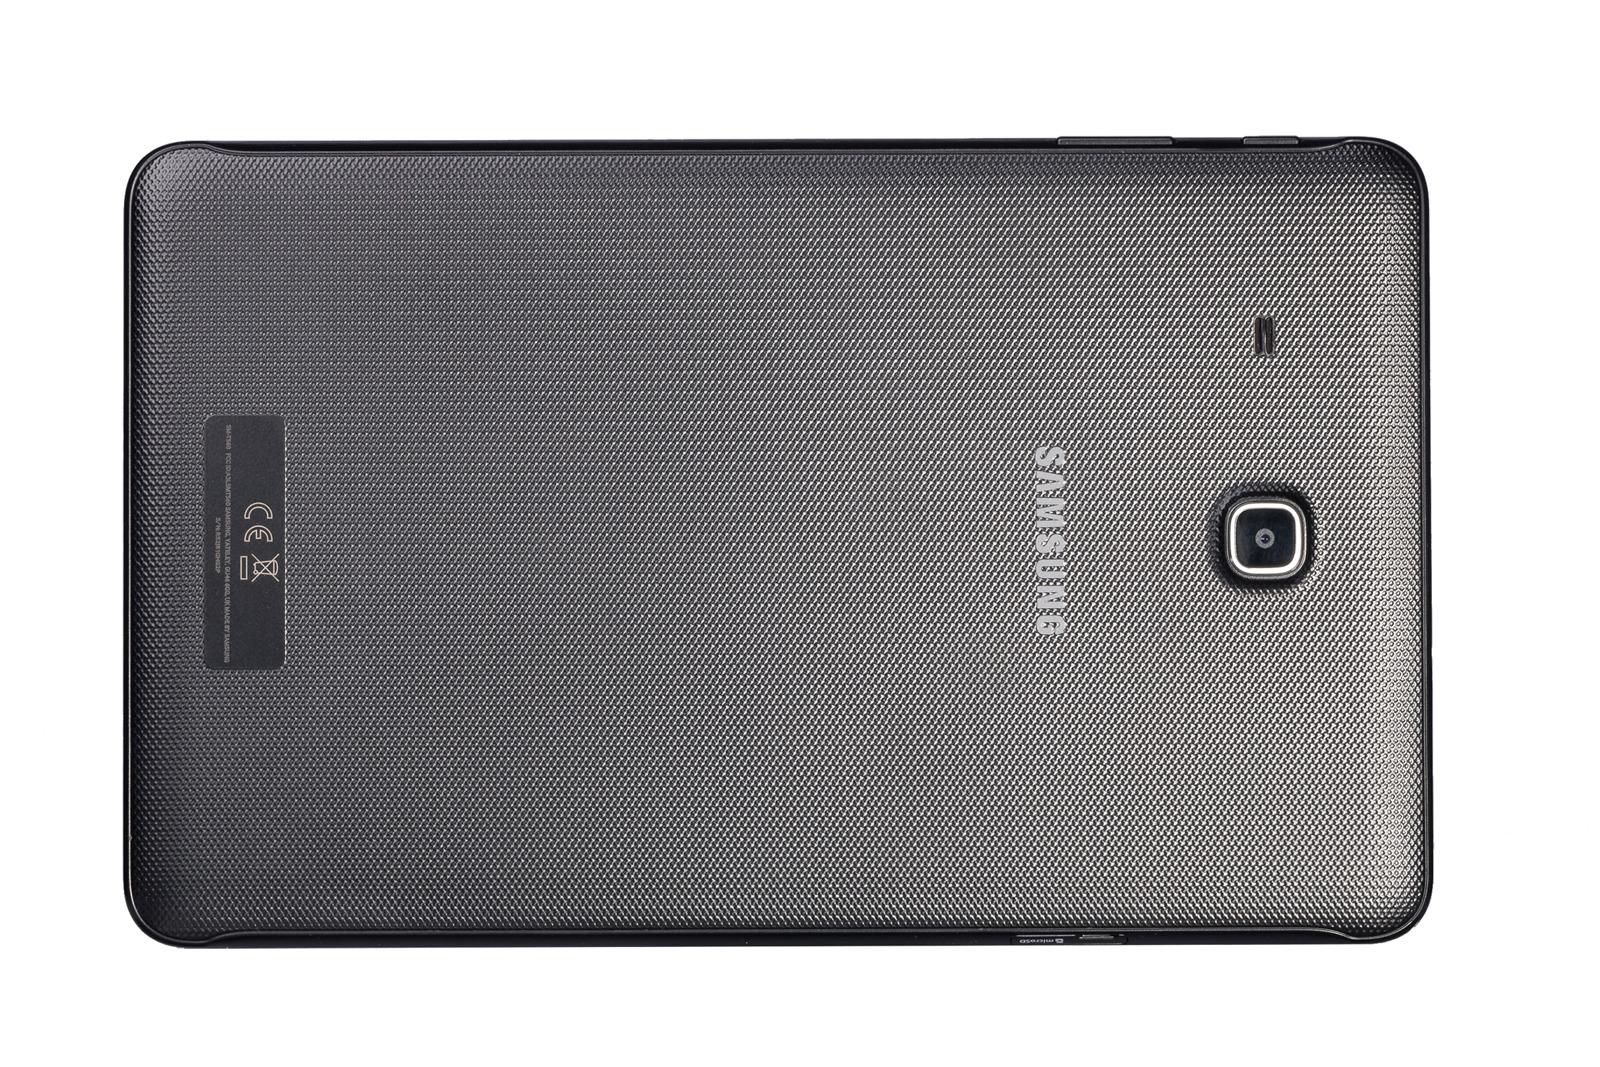 Samsung Galaxy Tab E 9.6 8GB Metallic Black WiFi SM-T560